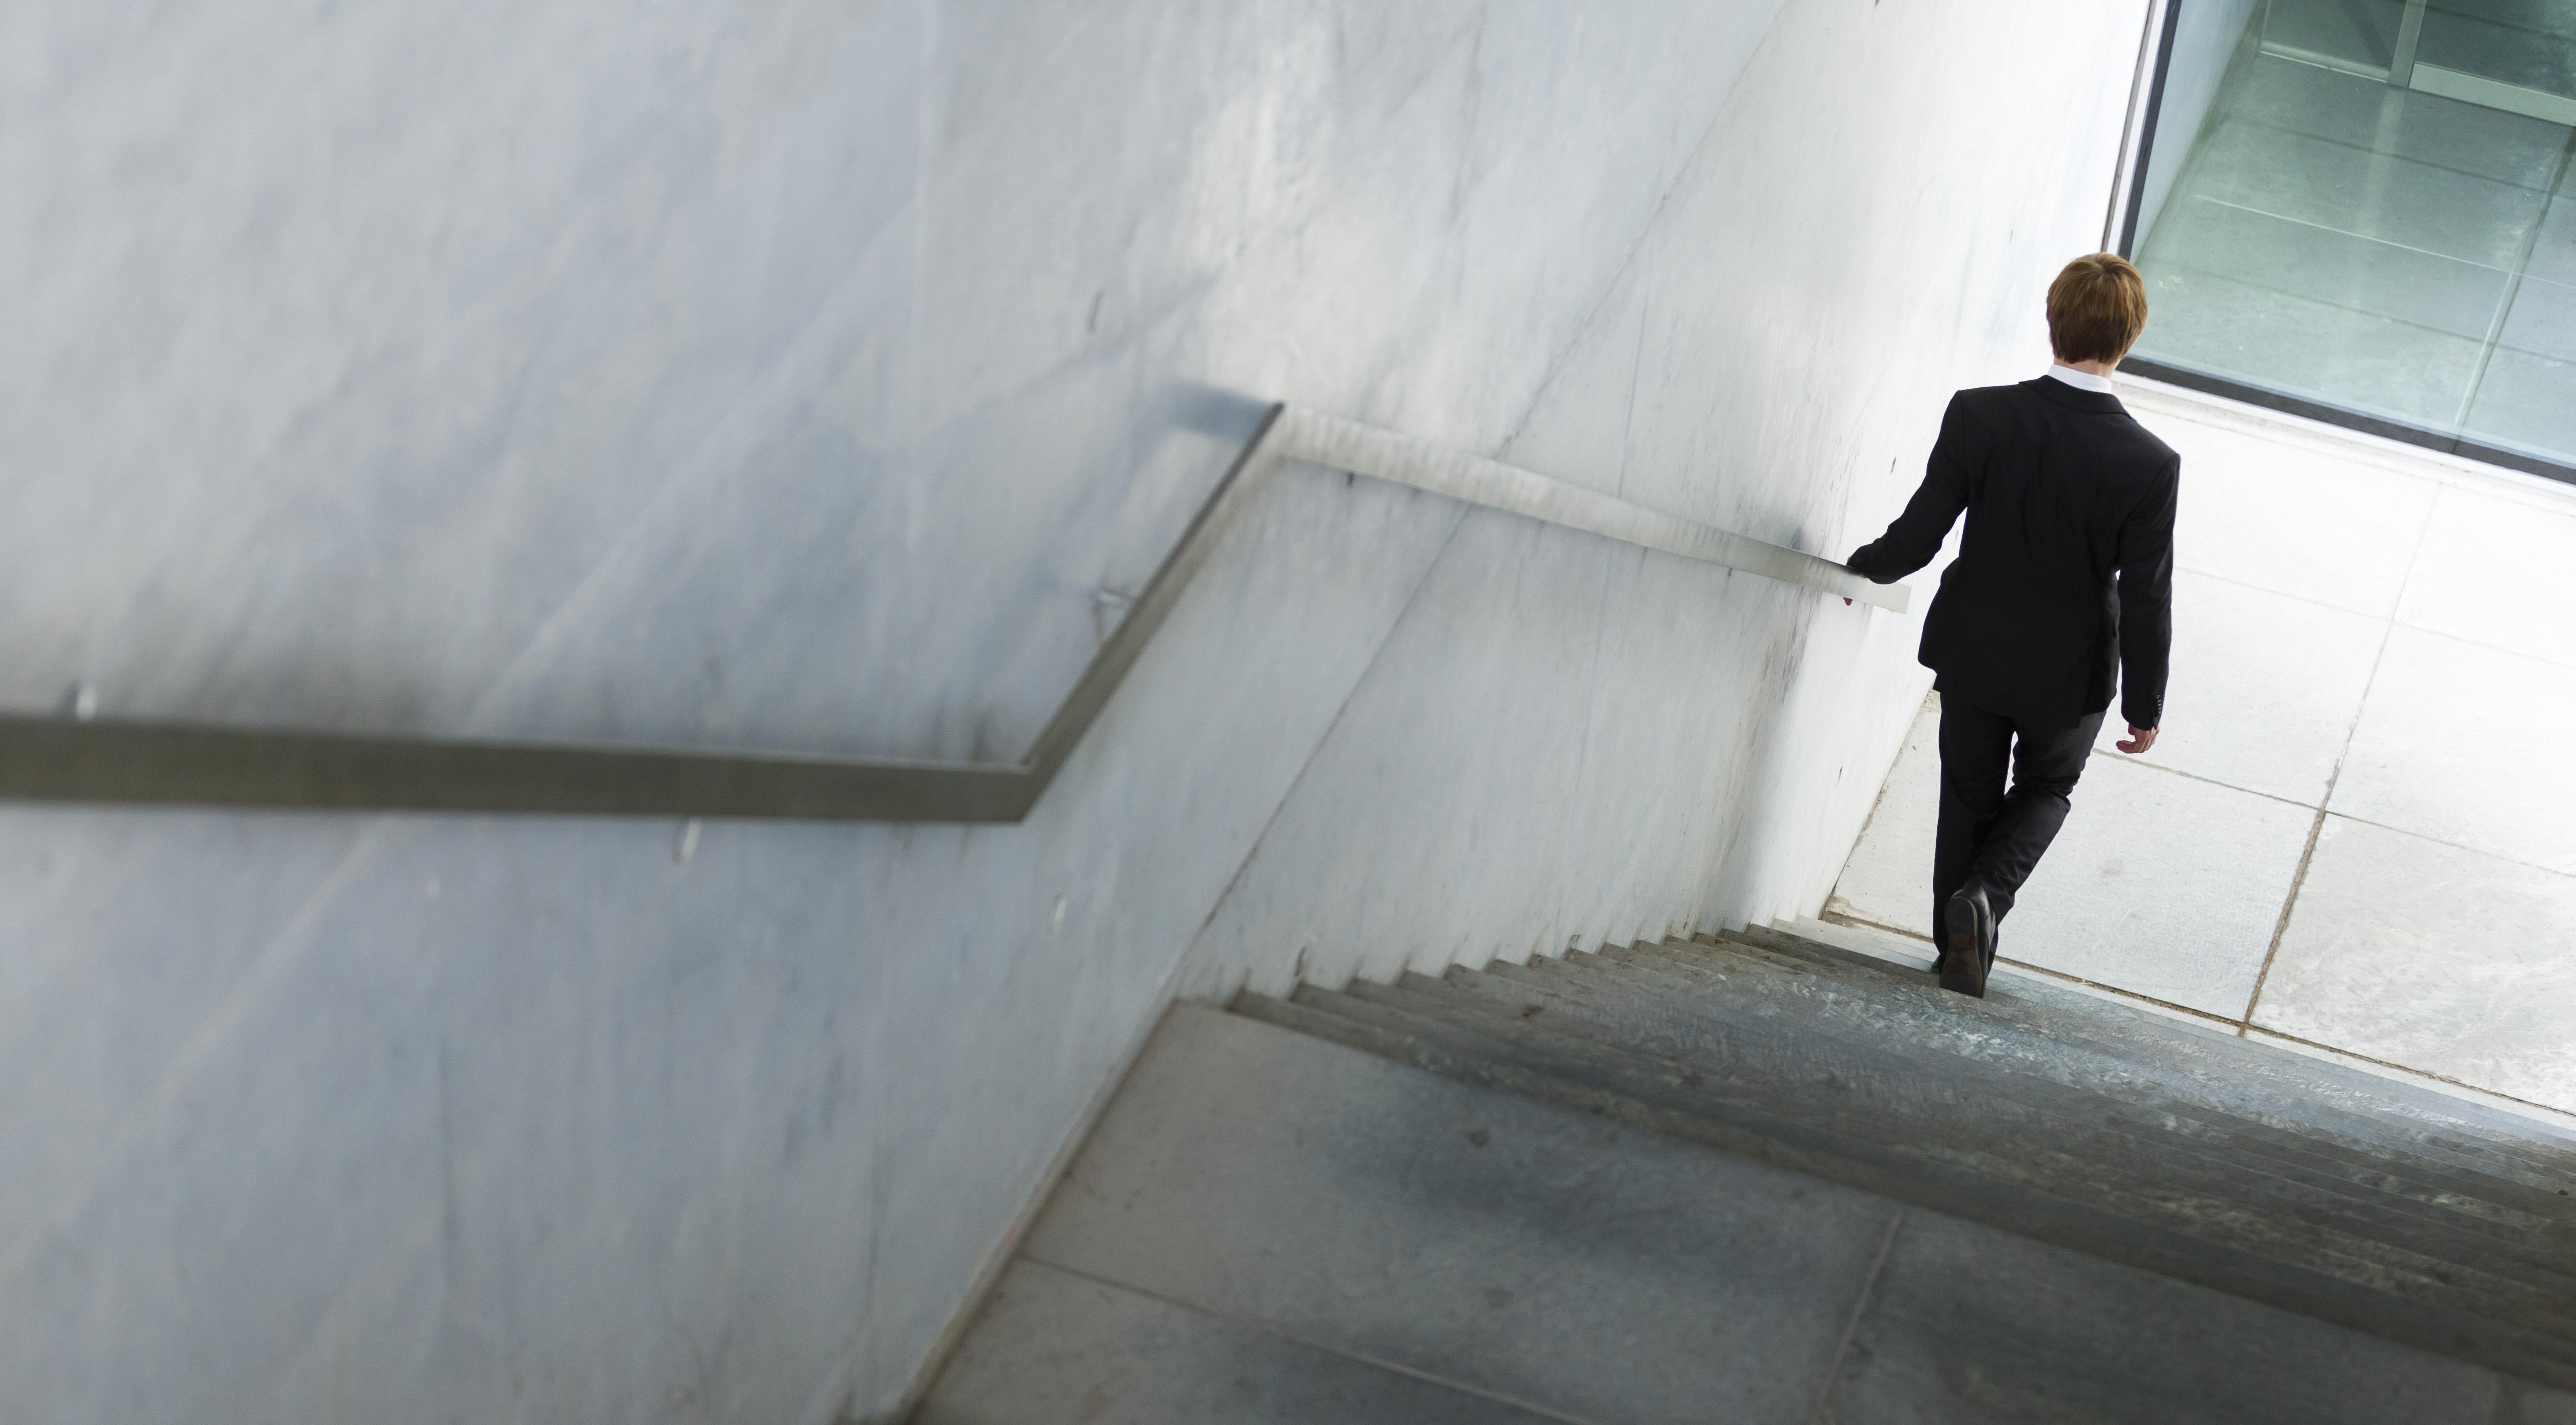 Man walks downstairs